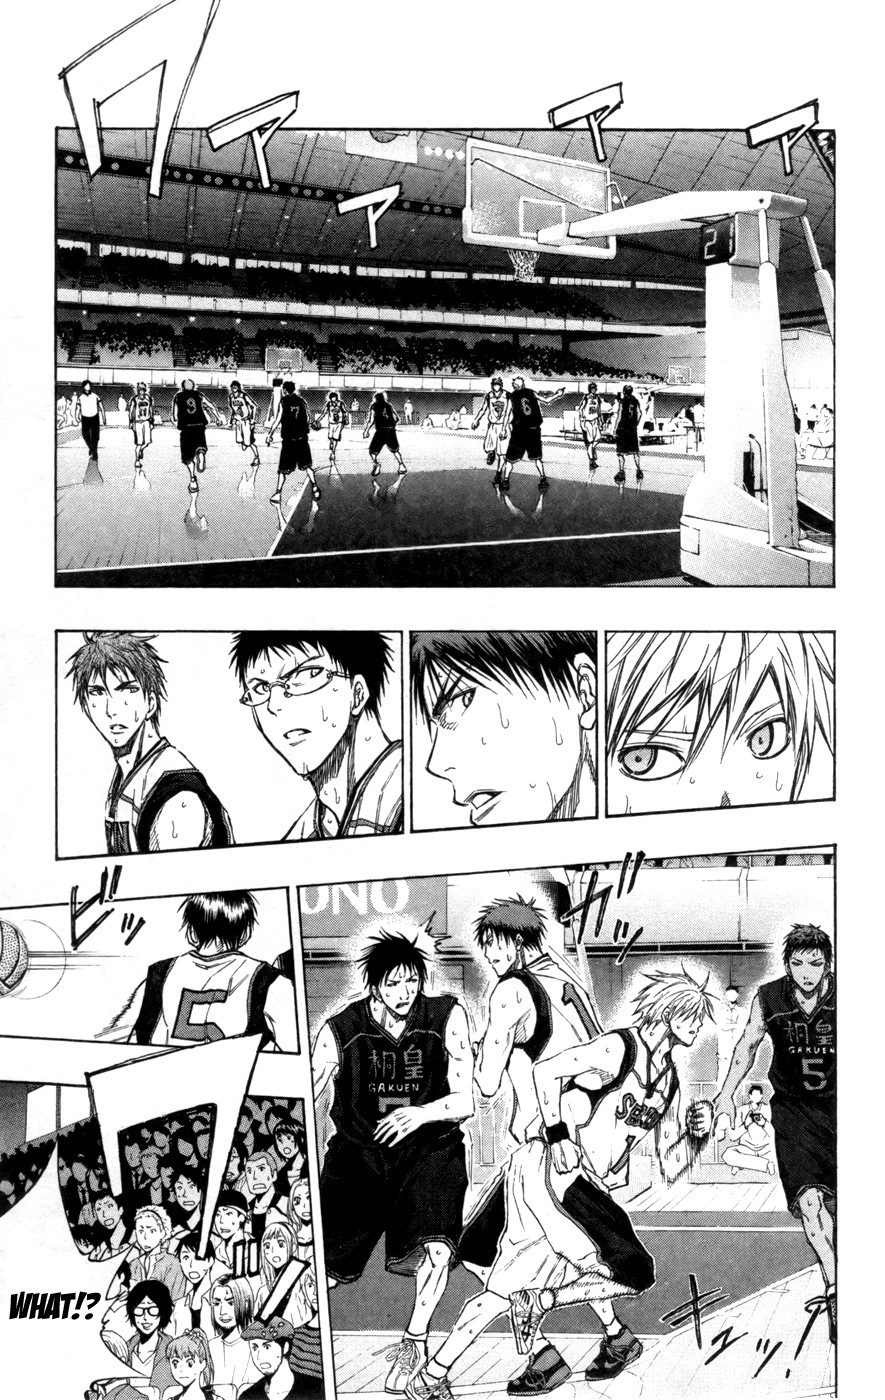 Kuroko no Basket Manga Chapter 119 - Image 4_035